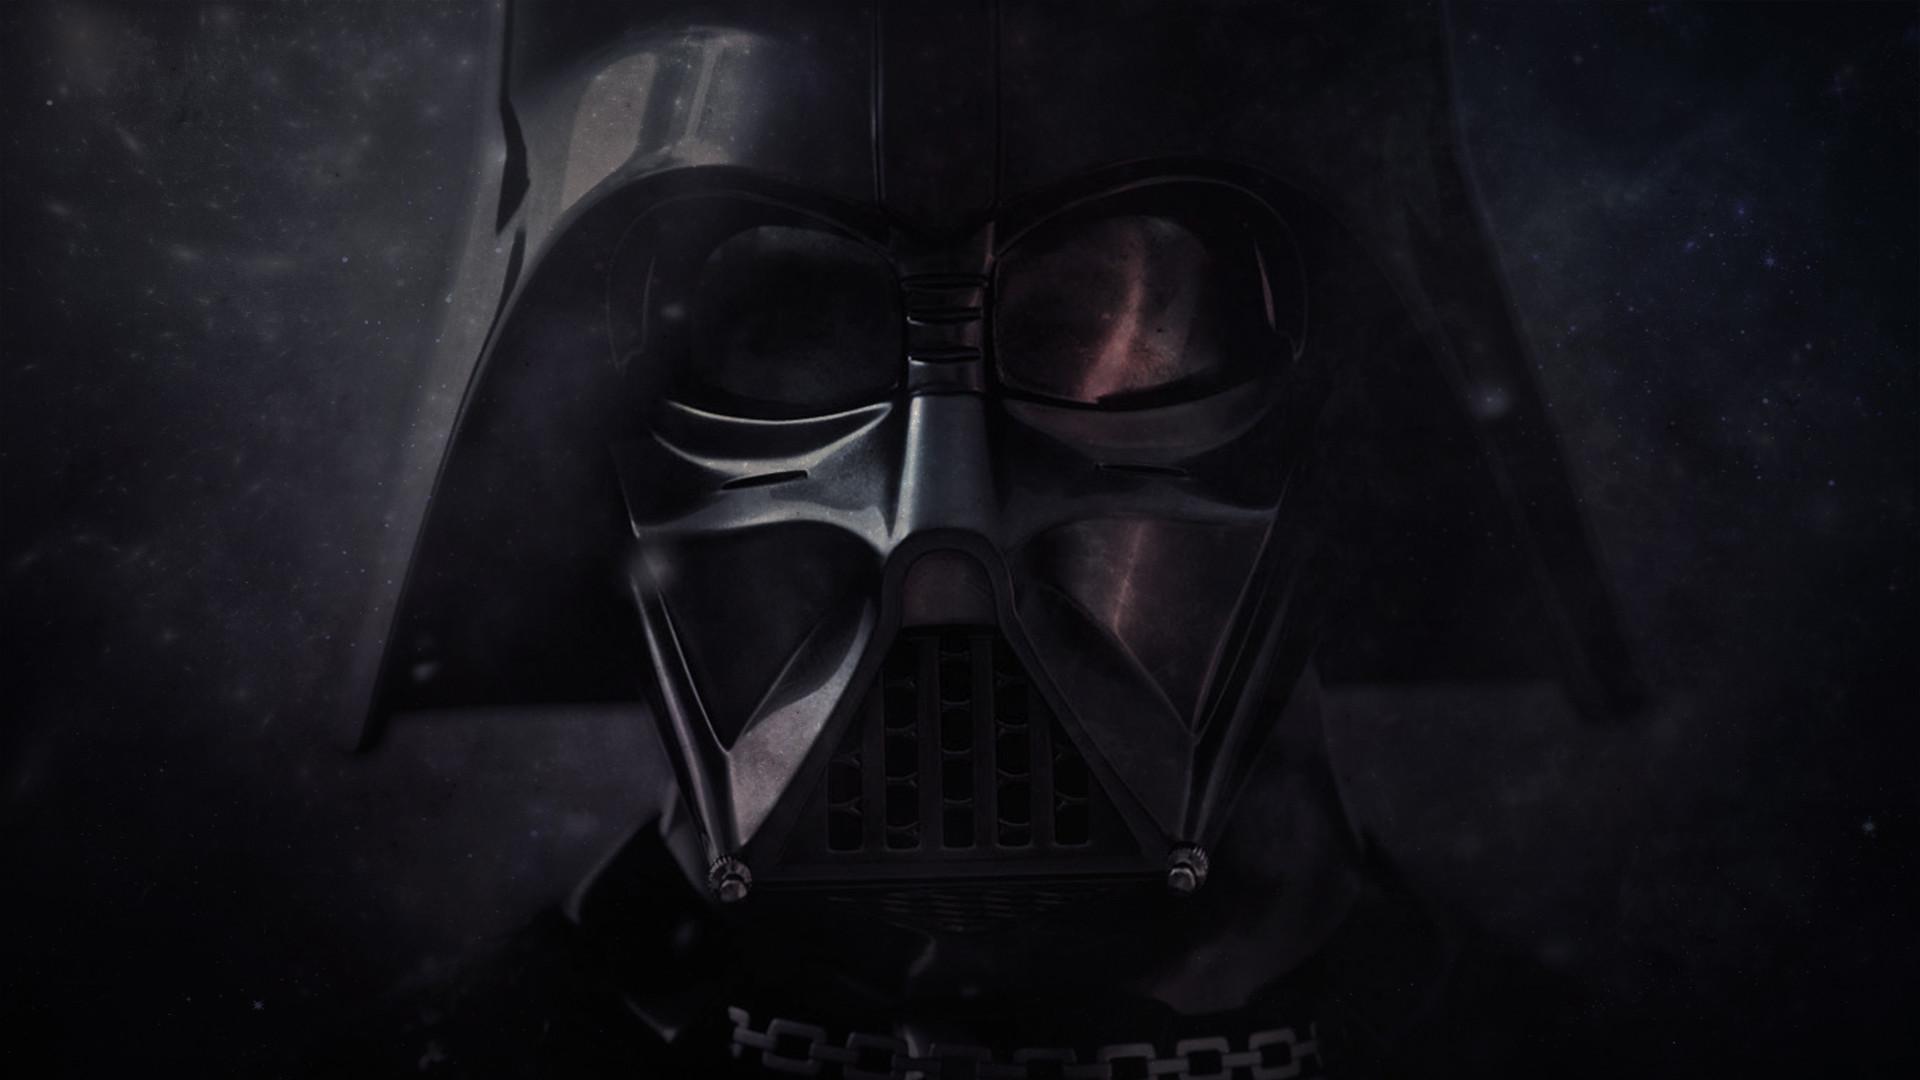 Darth Vader Live Wallpaper Android Apps on Google Play · Star Wars …